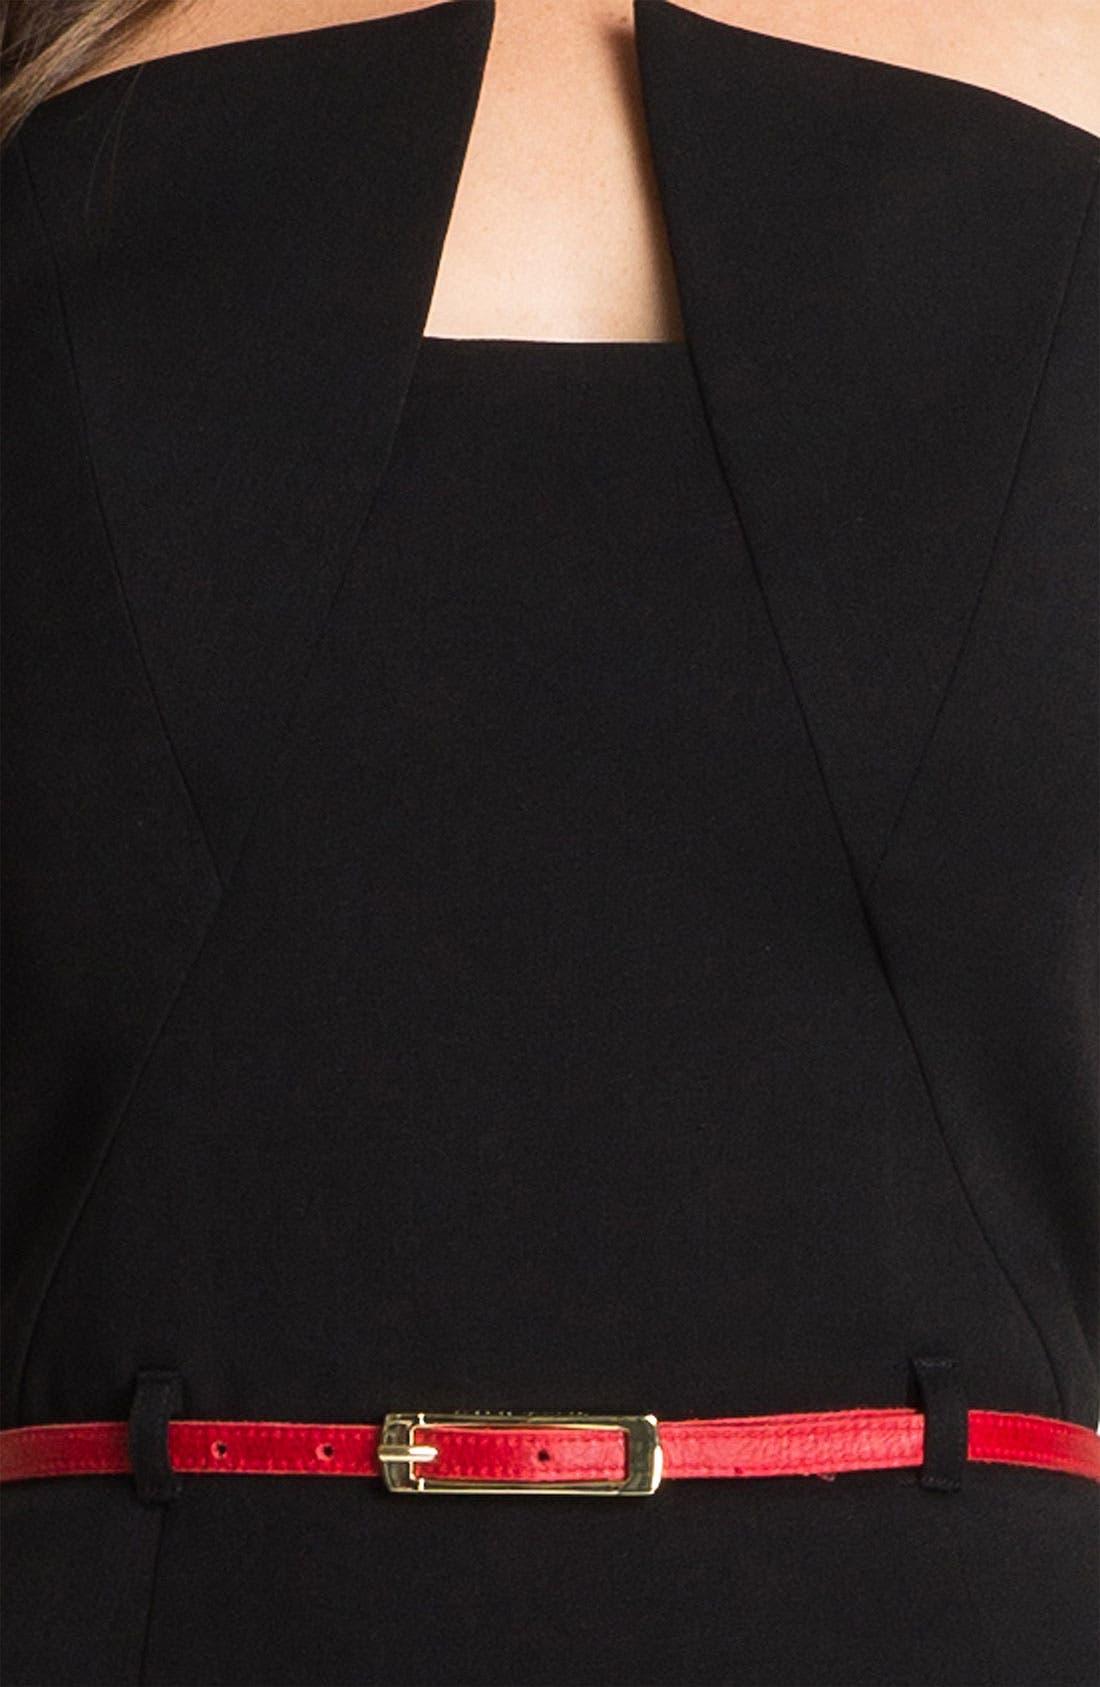 'Lena' Notch Neck Belted Sheath Dress,                             Alternate thumbnail 3, color,                             001